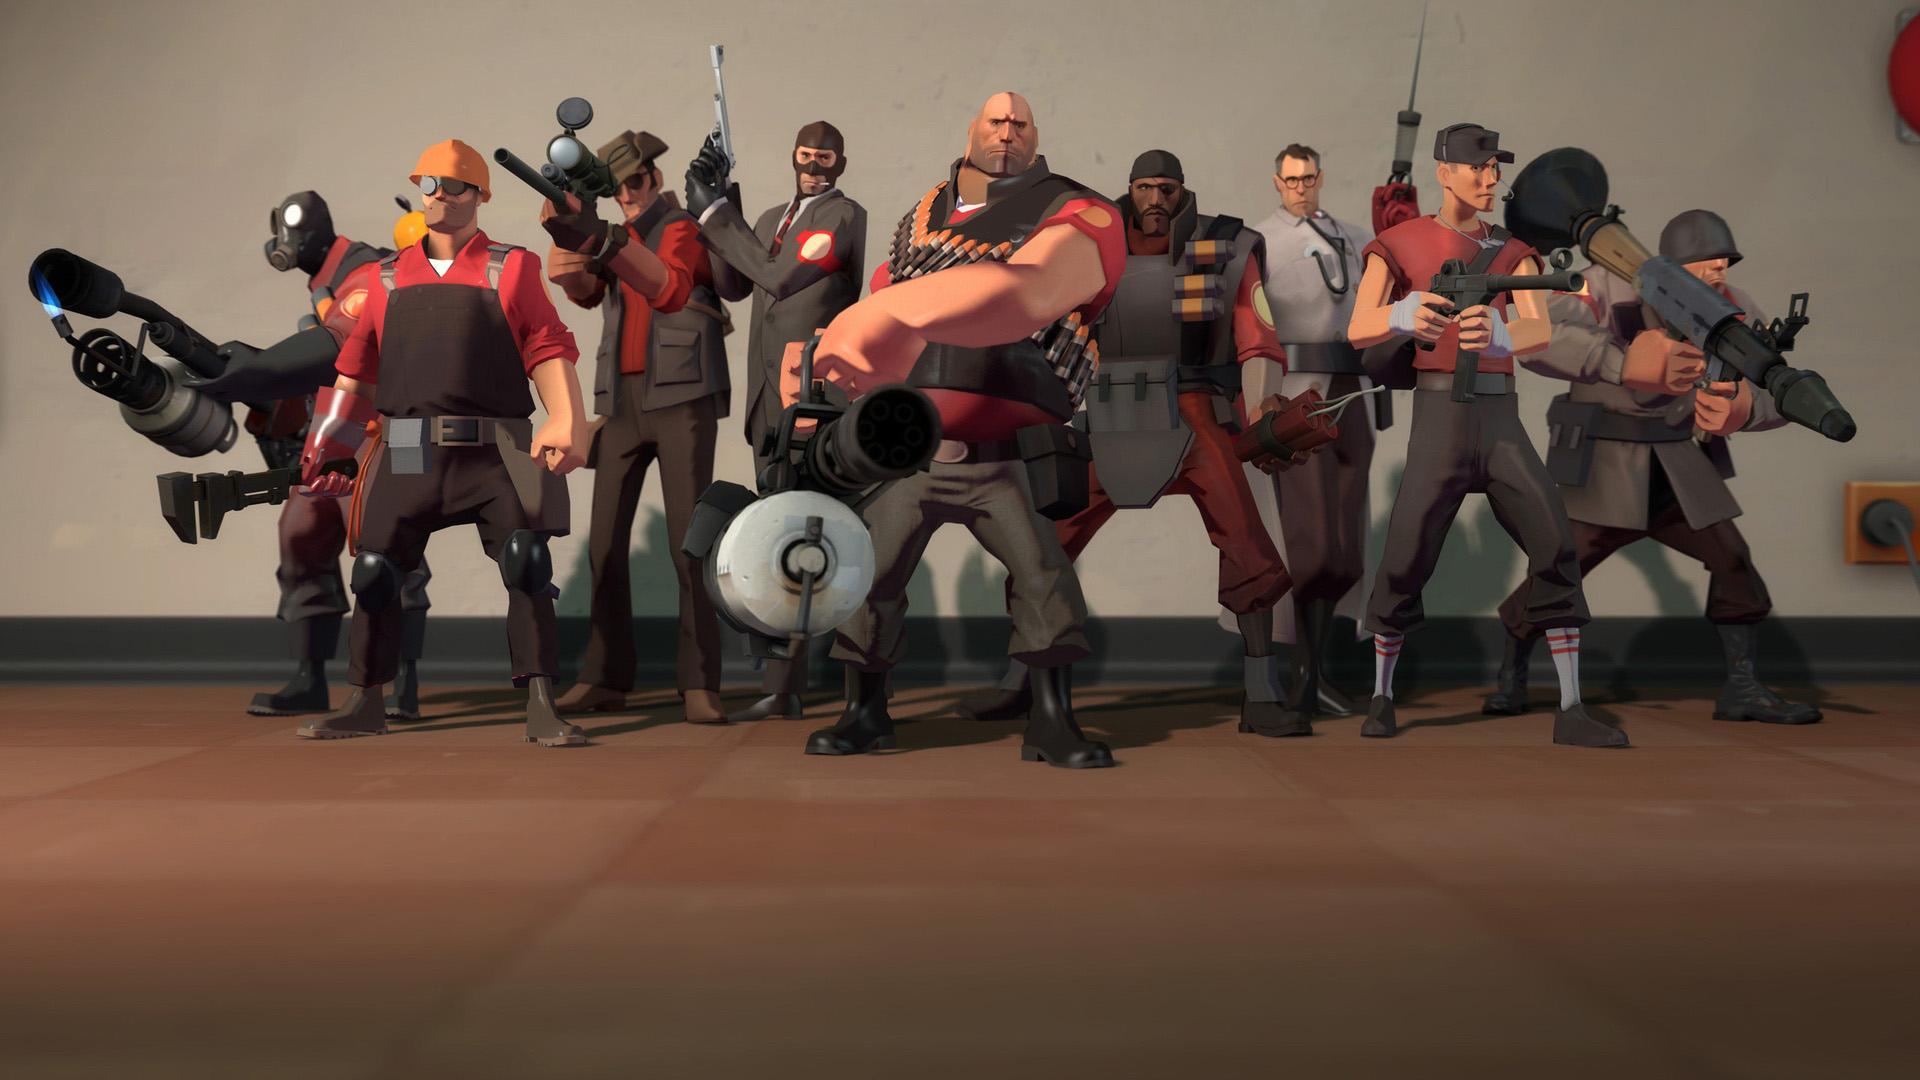 Team Fortress 2 - Valve